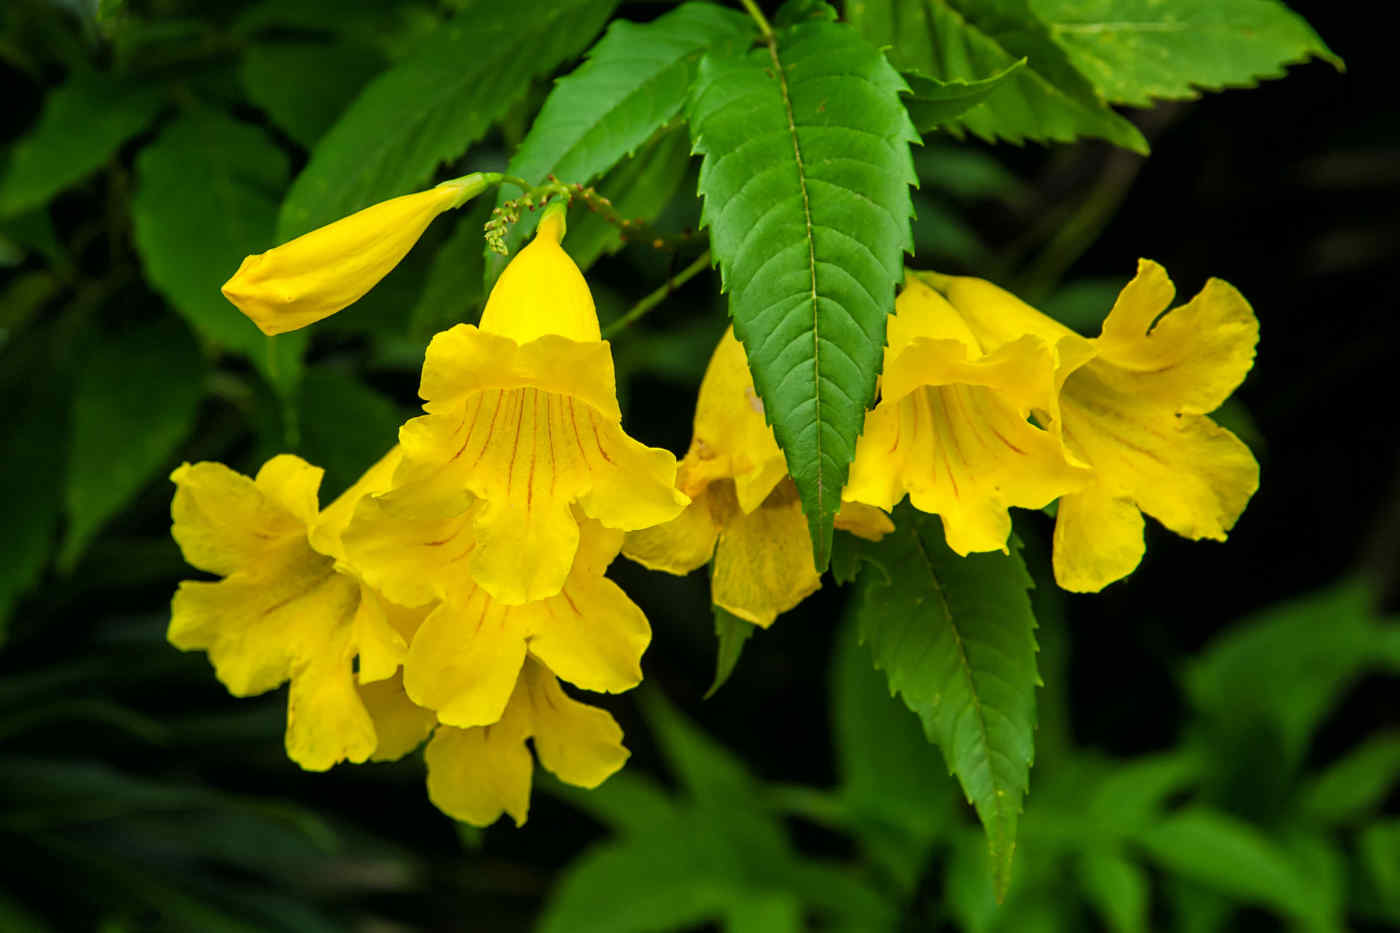 Yellow Elder flower